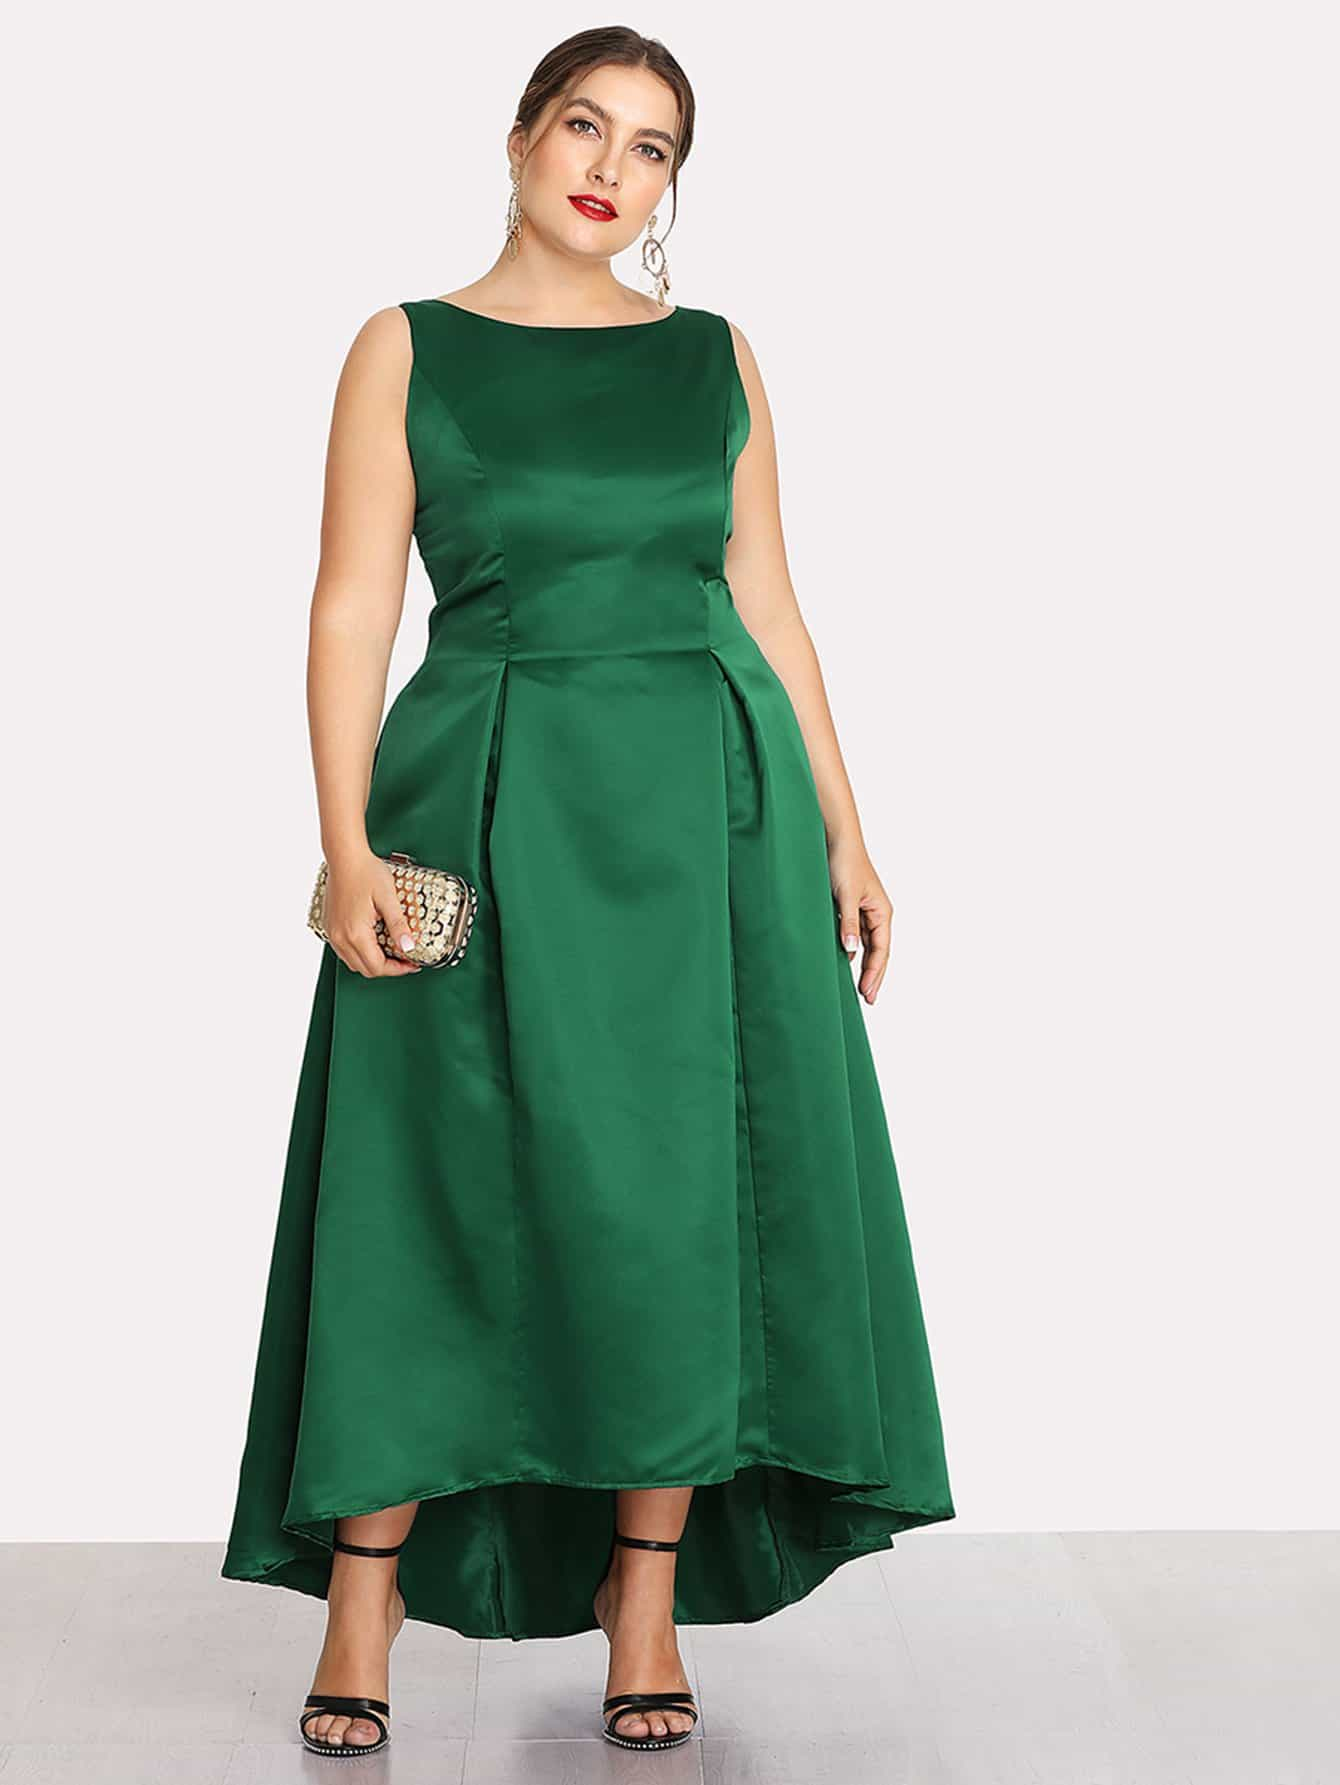 Zip Up Back Dip Hem Dress